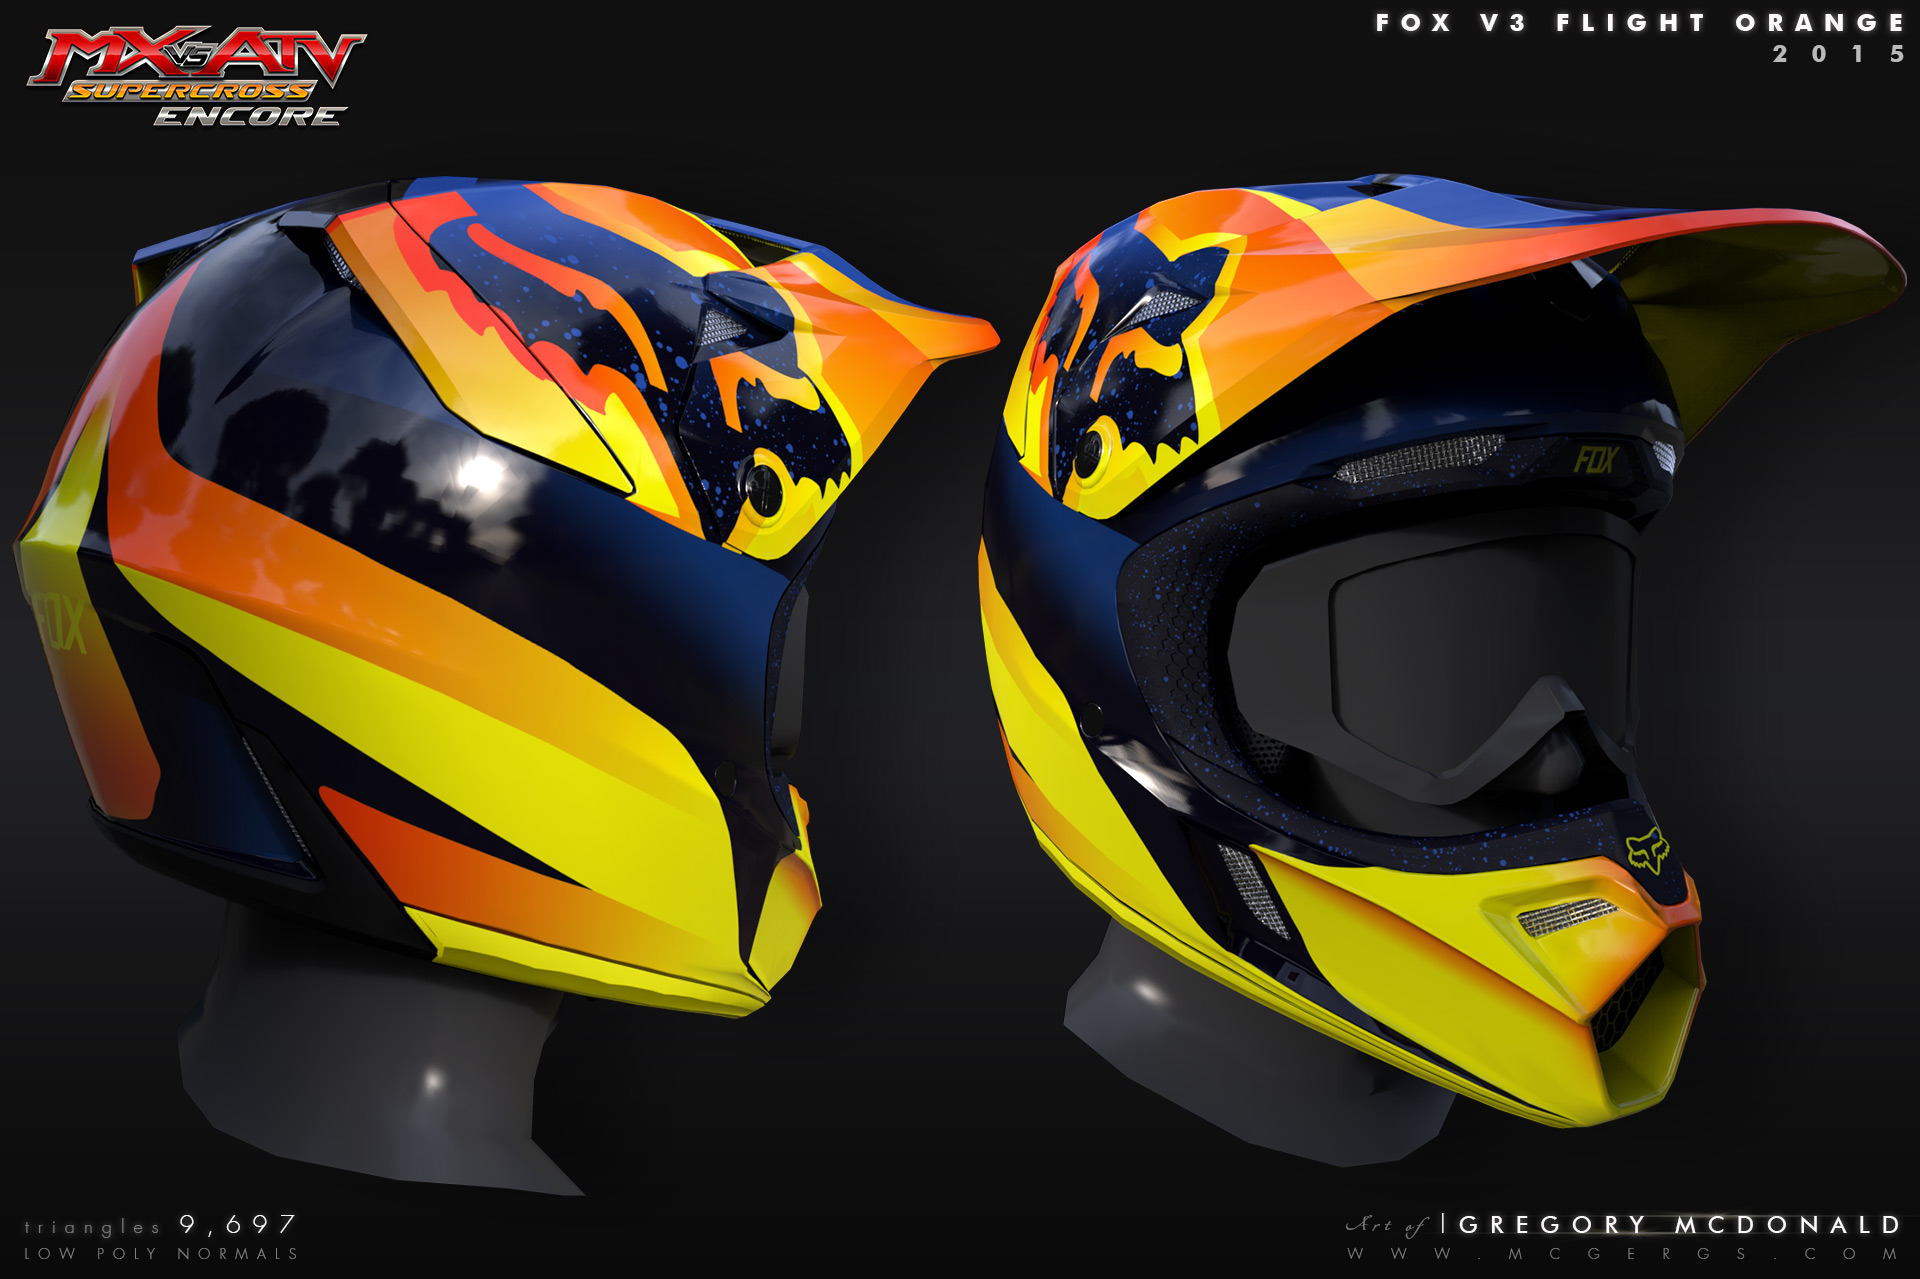 Helmet_FoxV3_Flight_Orange